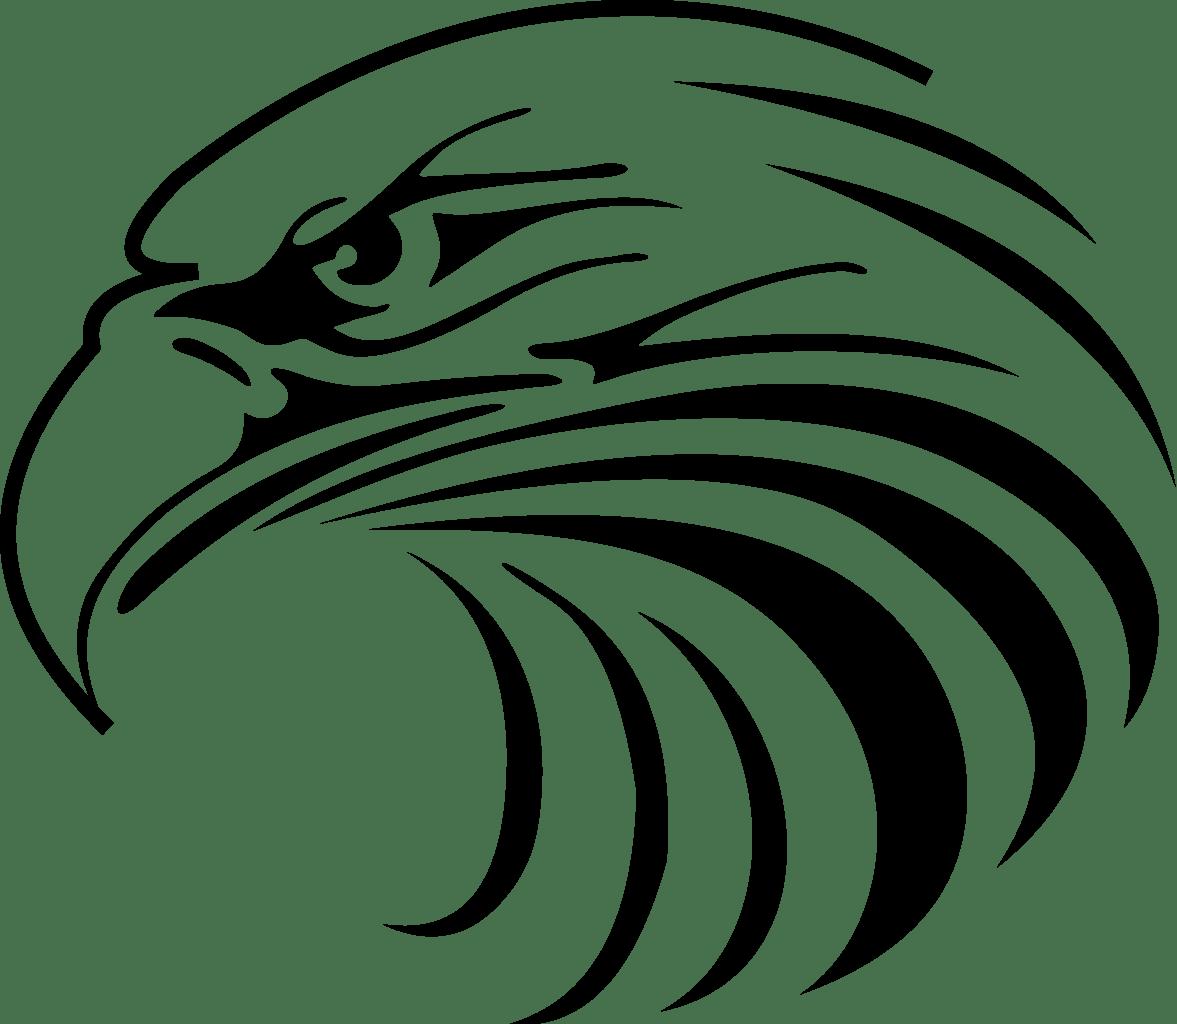 hight resolution of 1177x1024 eagle head mascot clipart